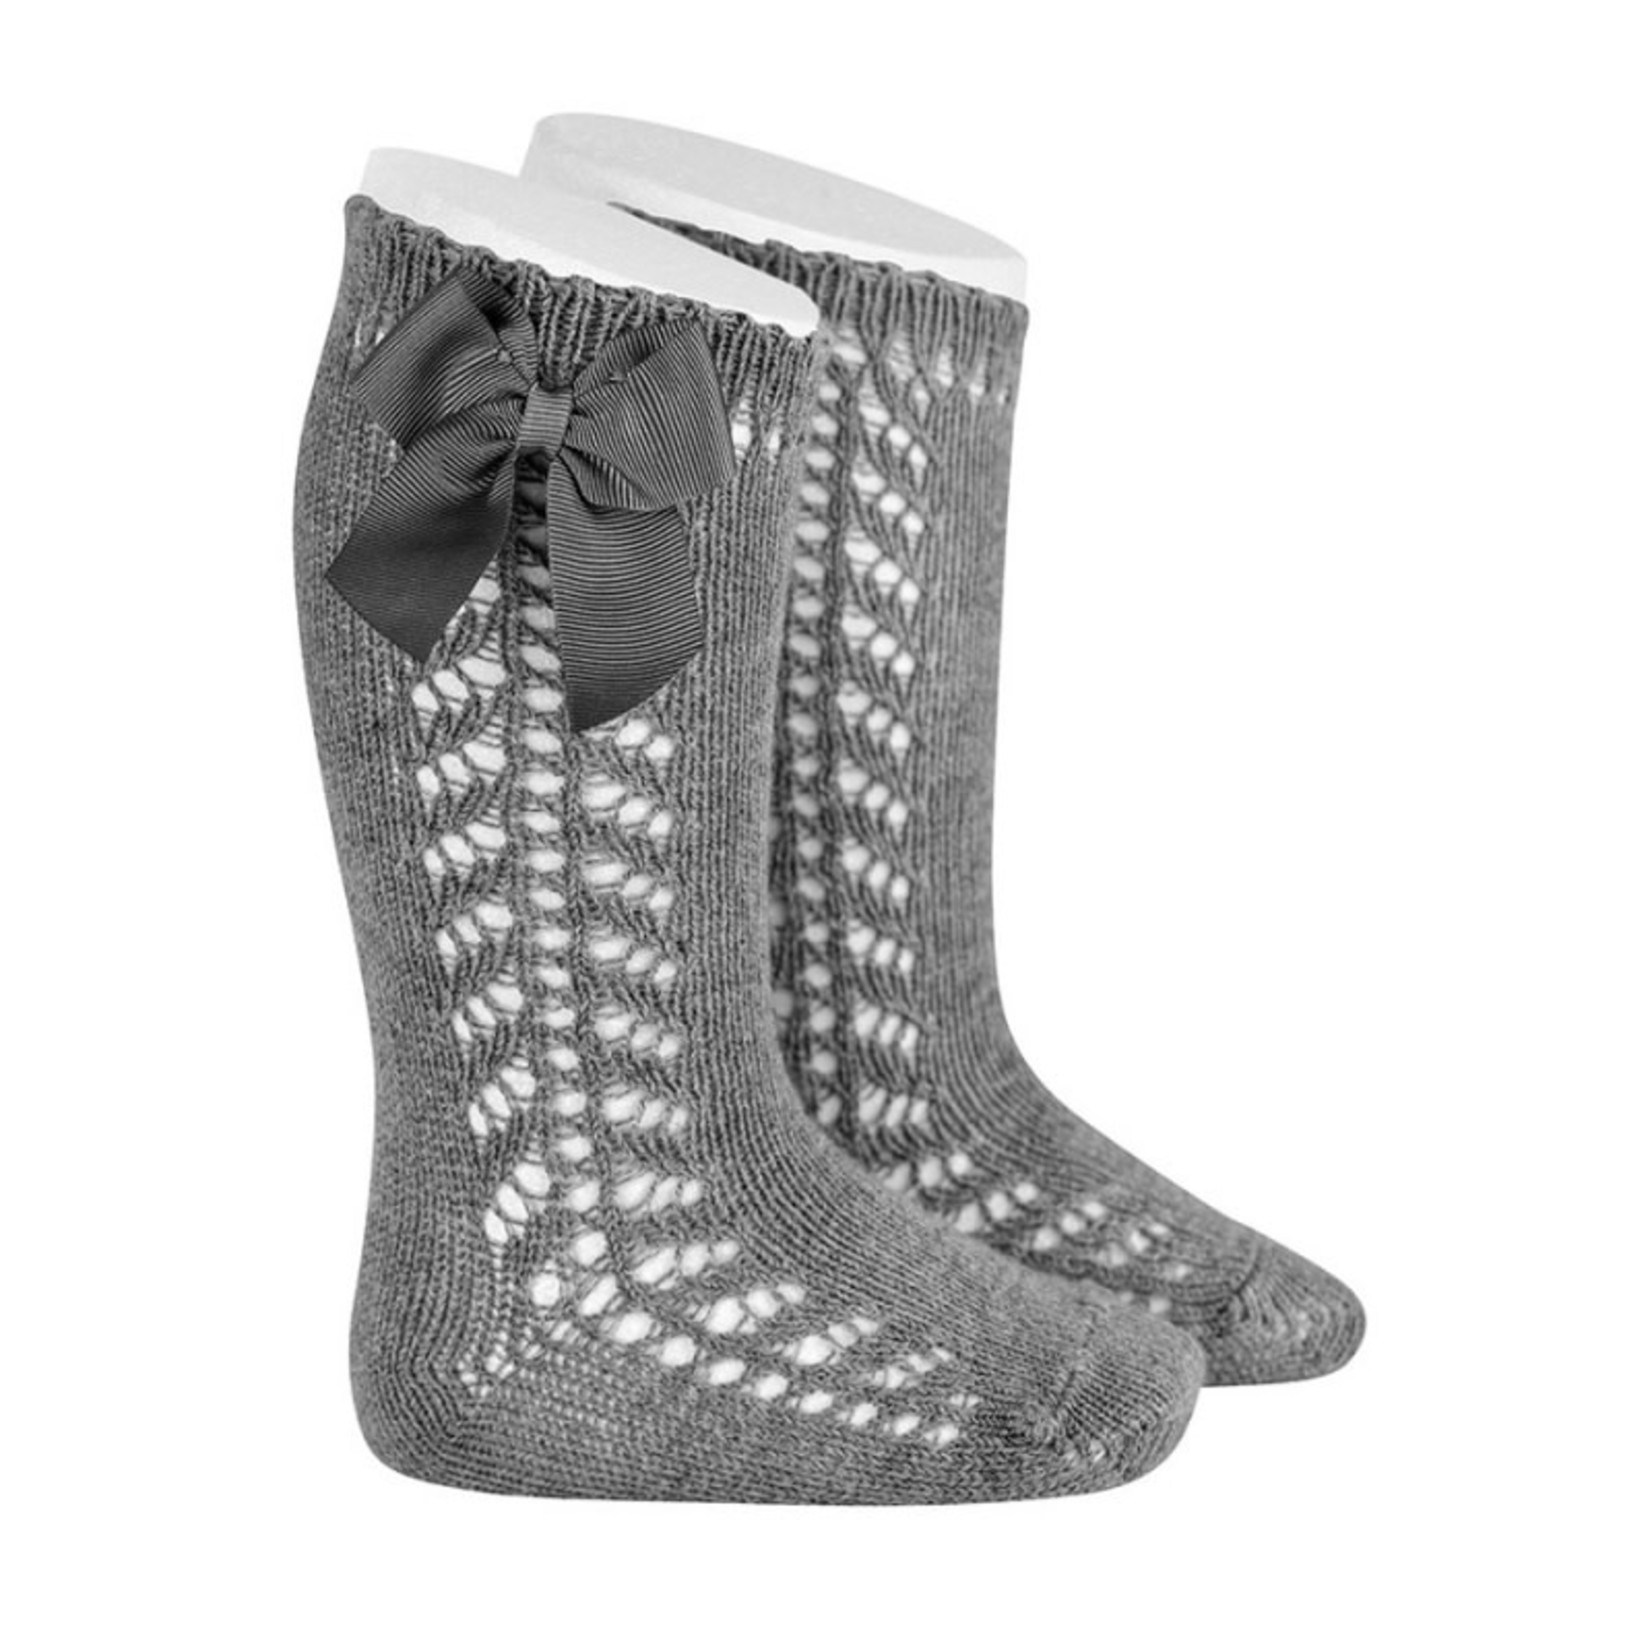 Newborn Knee Socks - Gray